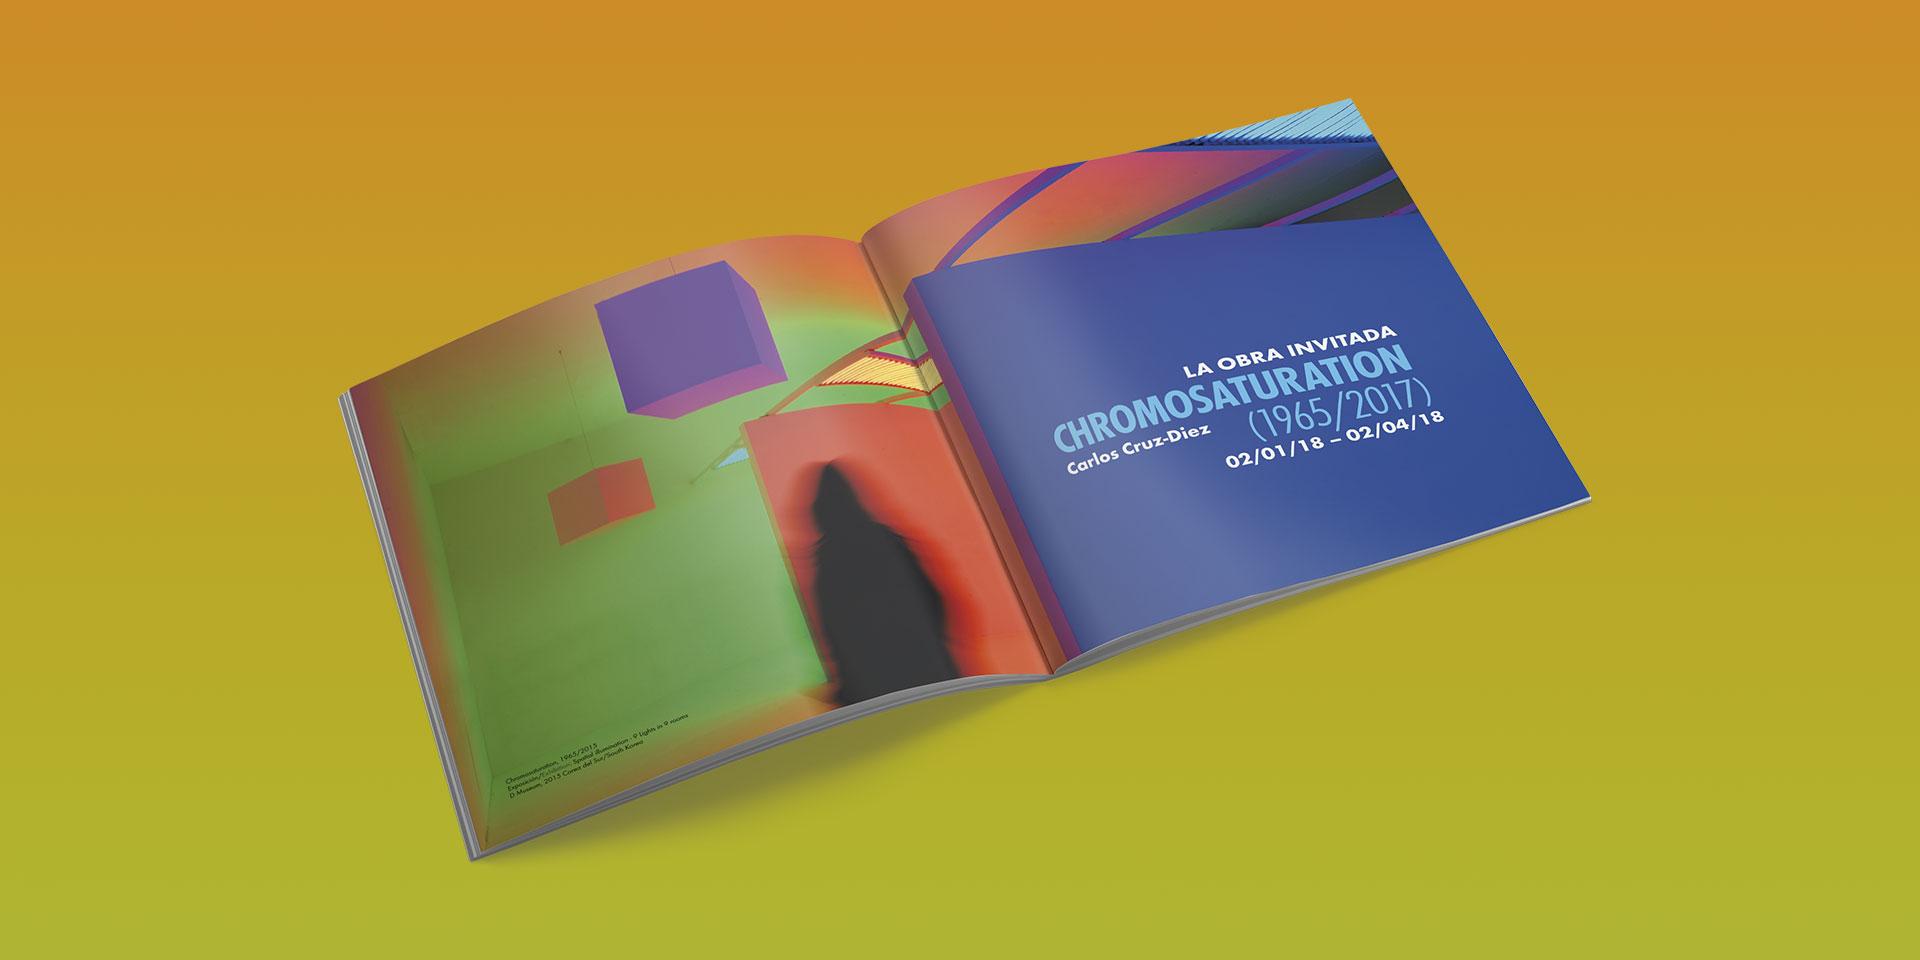 diseño campaña exposicion chromosaturation museo wurth la rioja